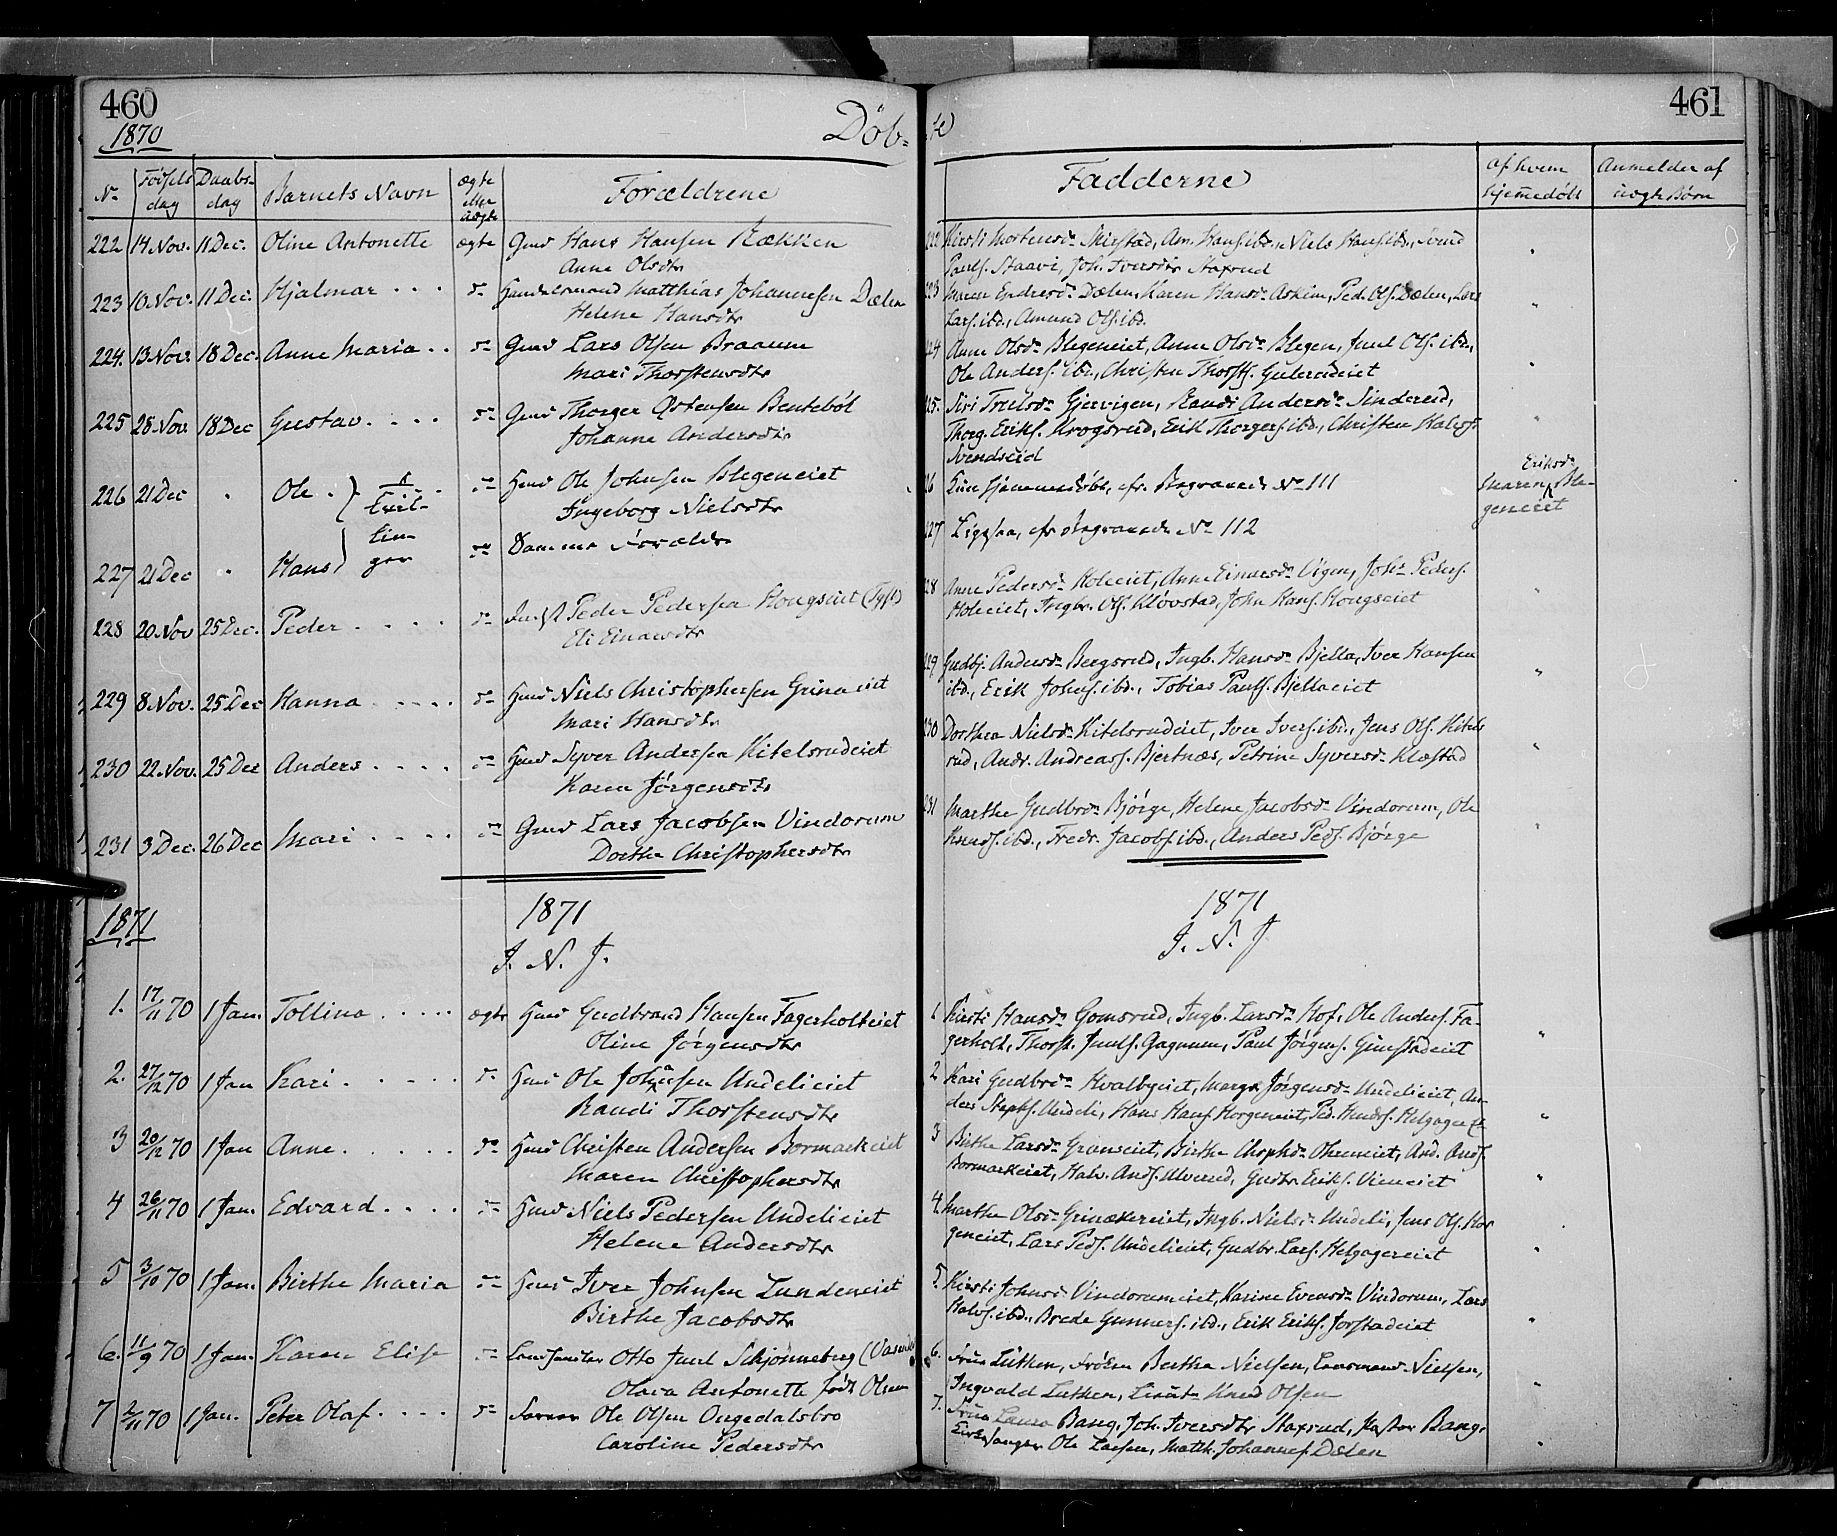 SAH, Gran prestekontor, Ministerialbok nr. 12, 1856-1874, s. 460-461